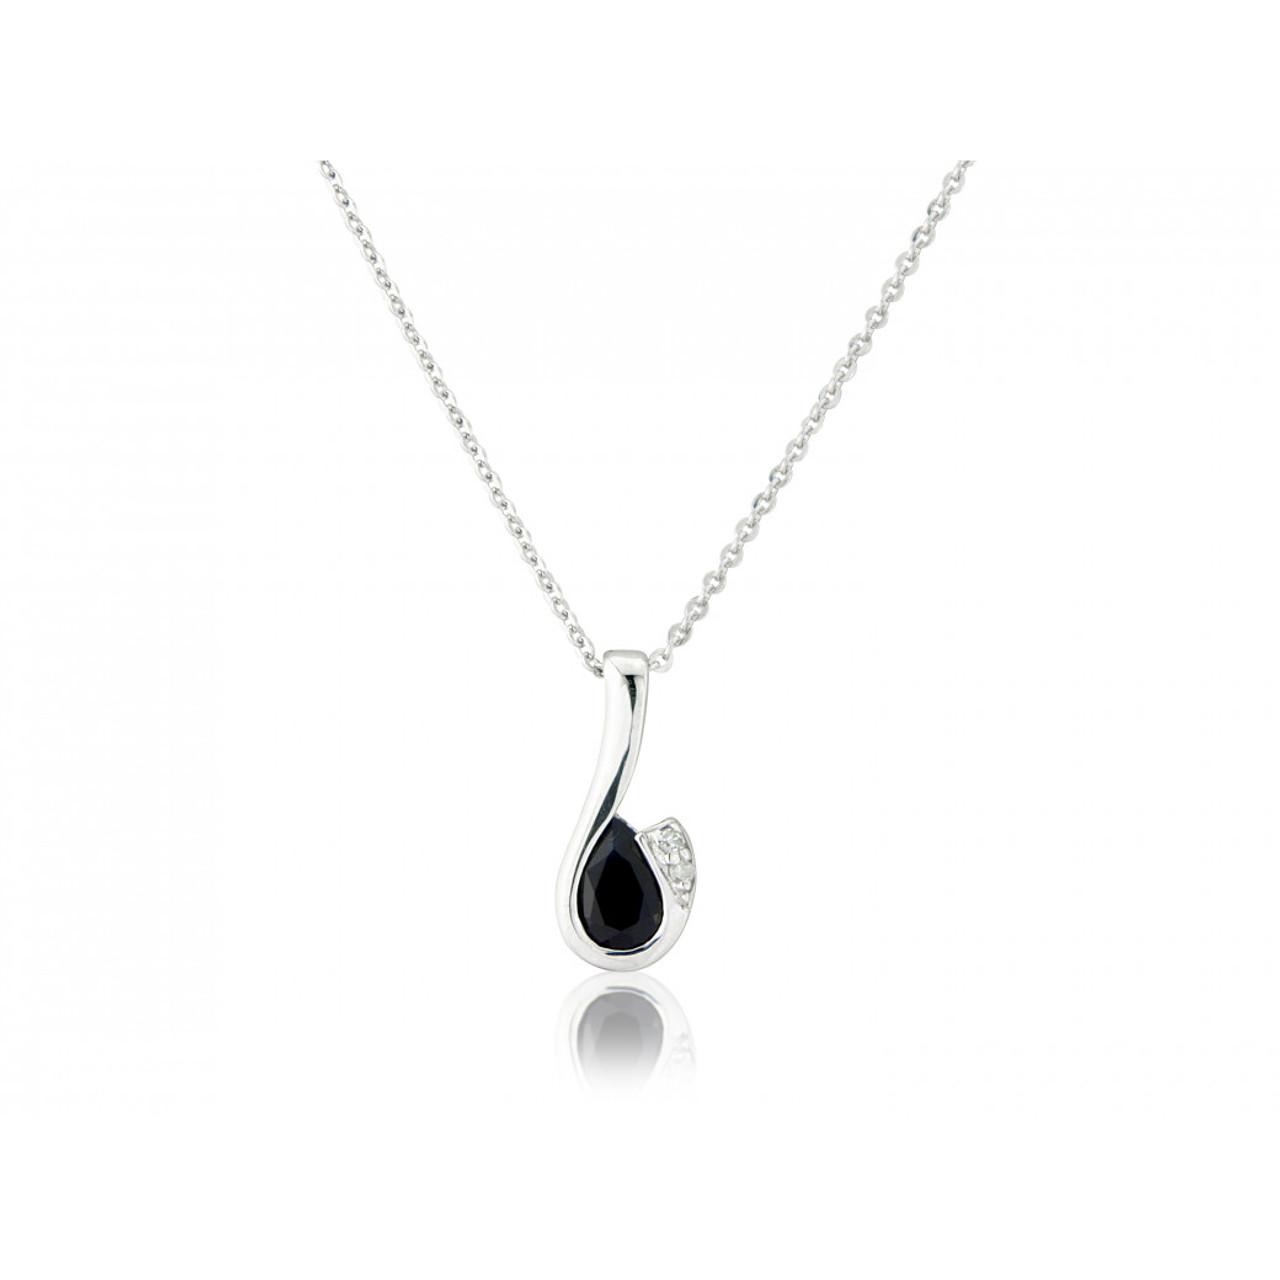 9ct White Gold Sapphire & Diamond Curl Pendant Necklace